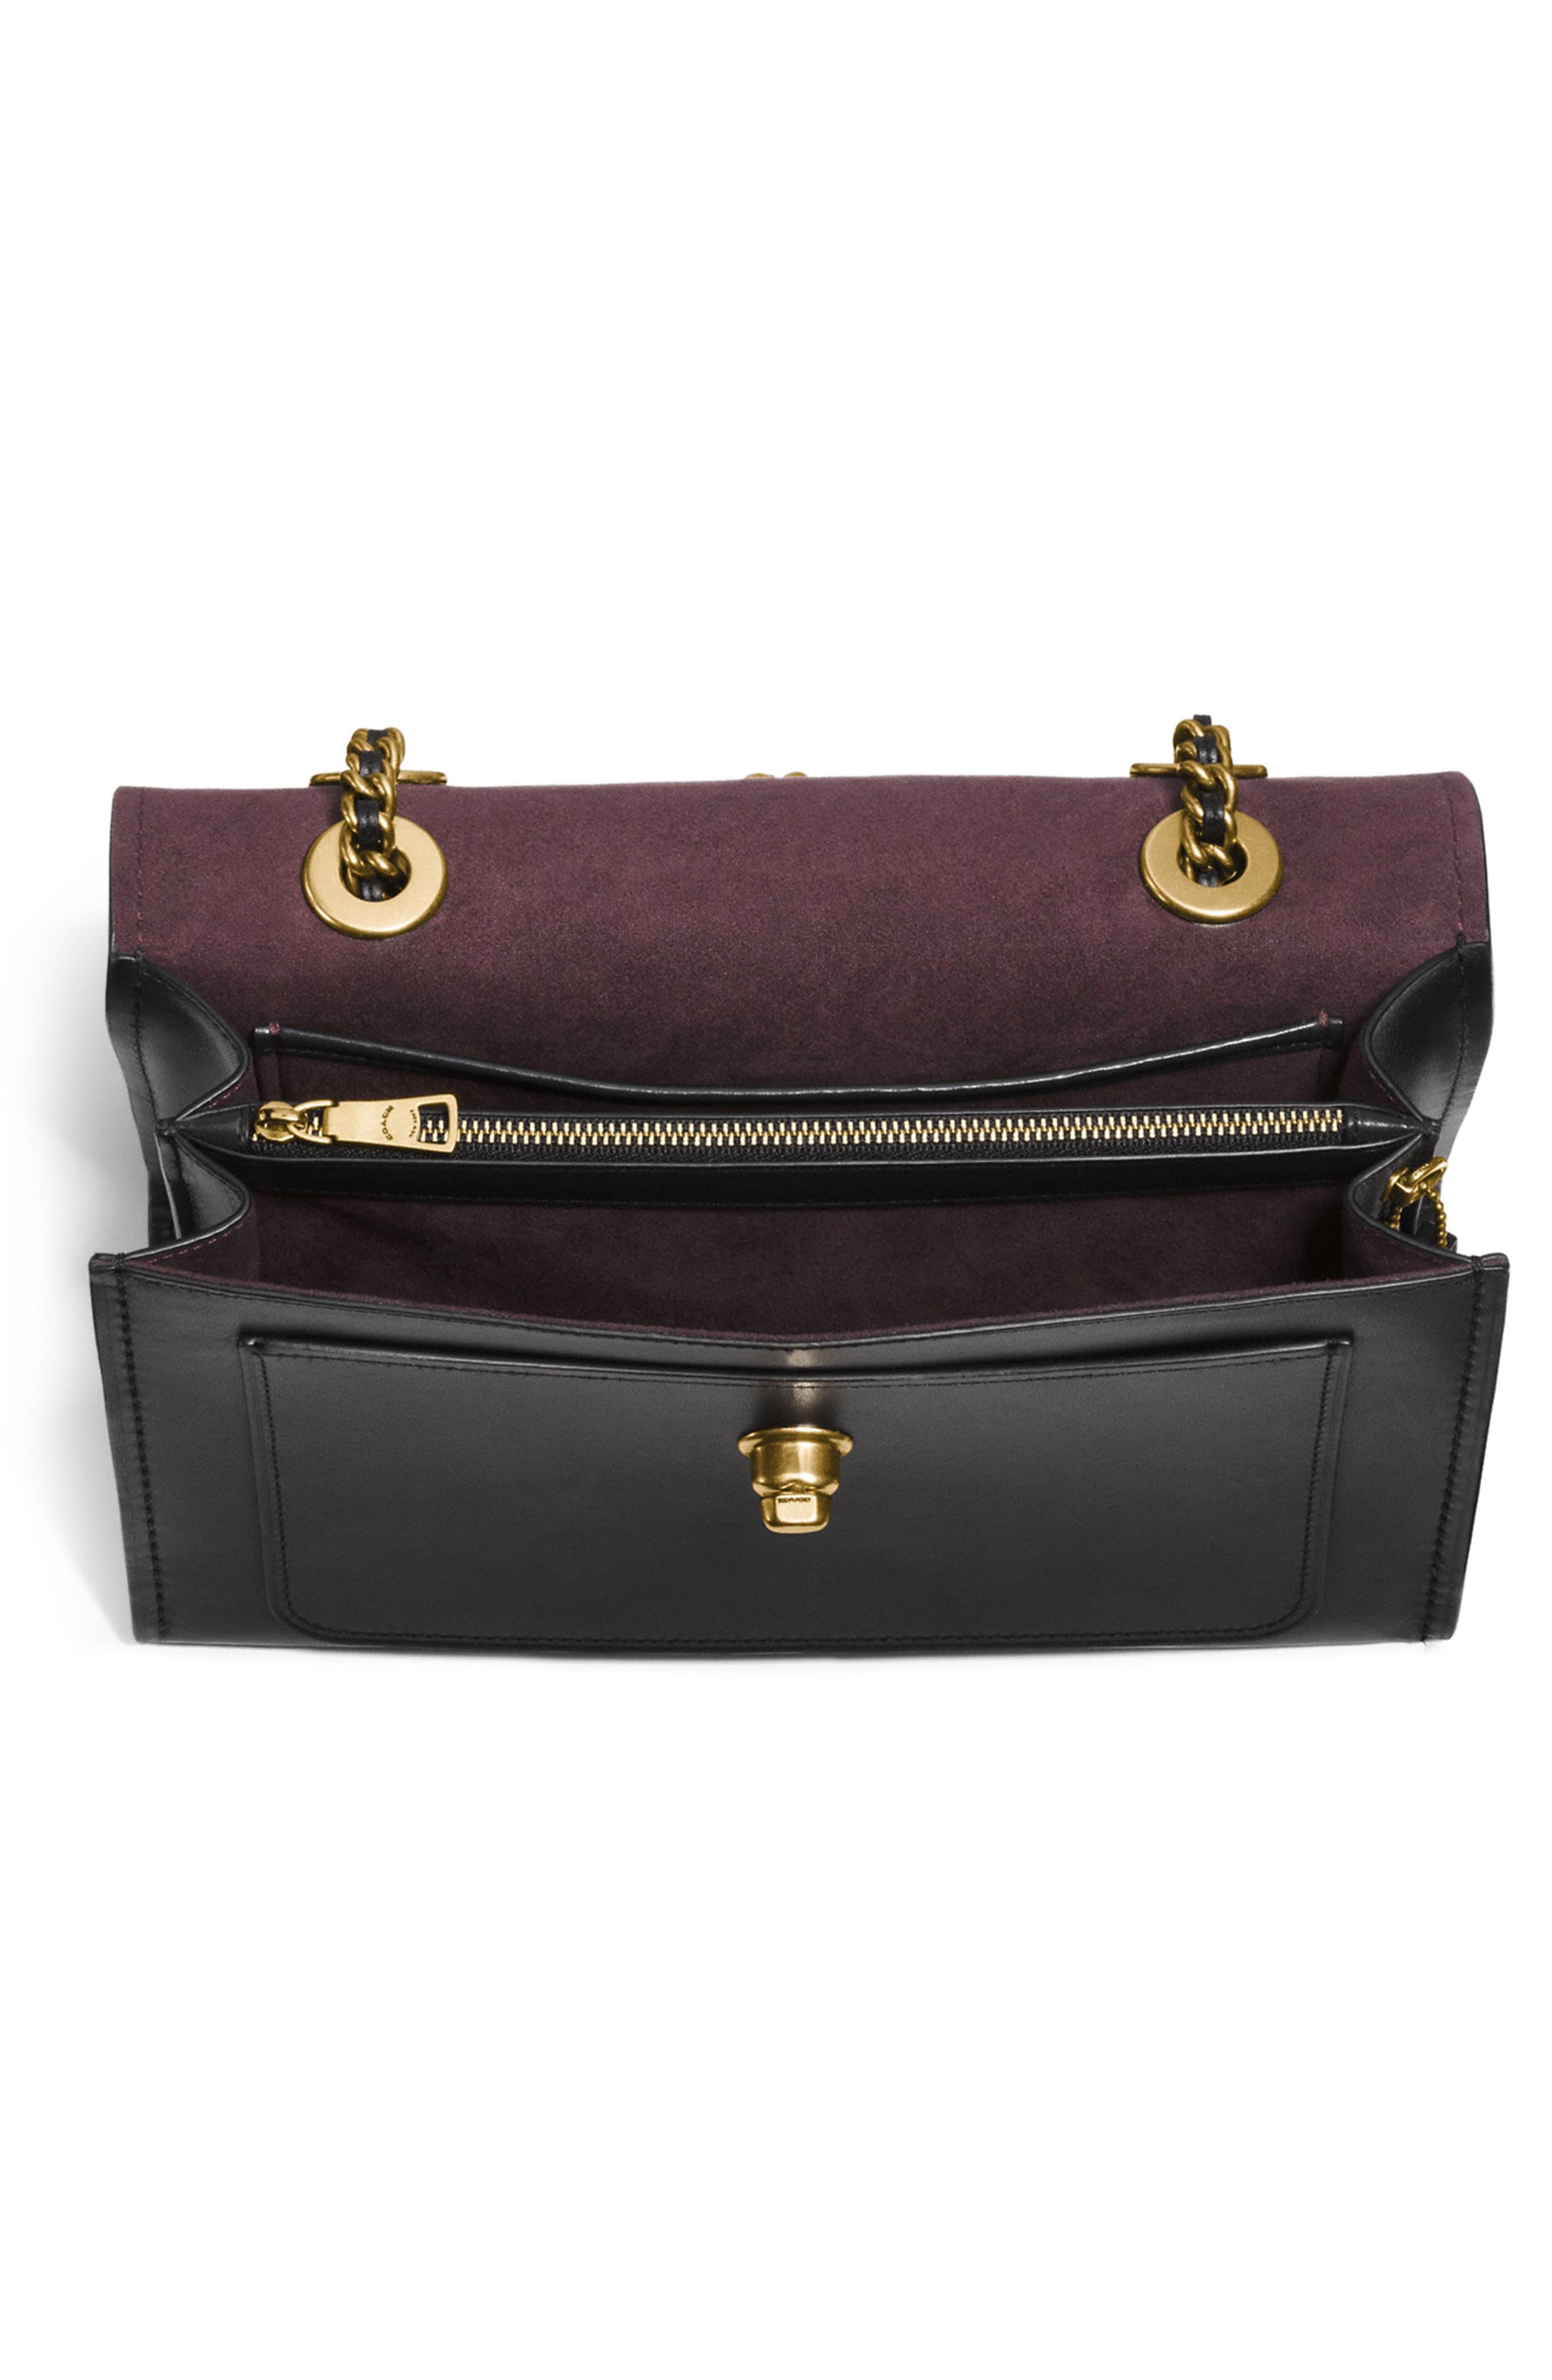 COACH,                             Parker Leather Shoulder Bag,                             Alternate thumbnail 4, color,                             001